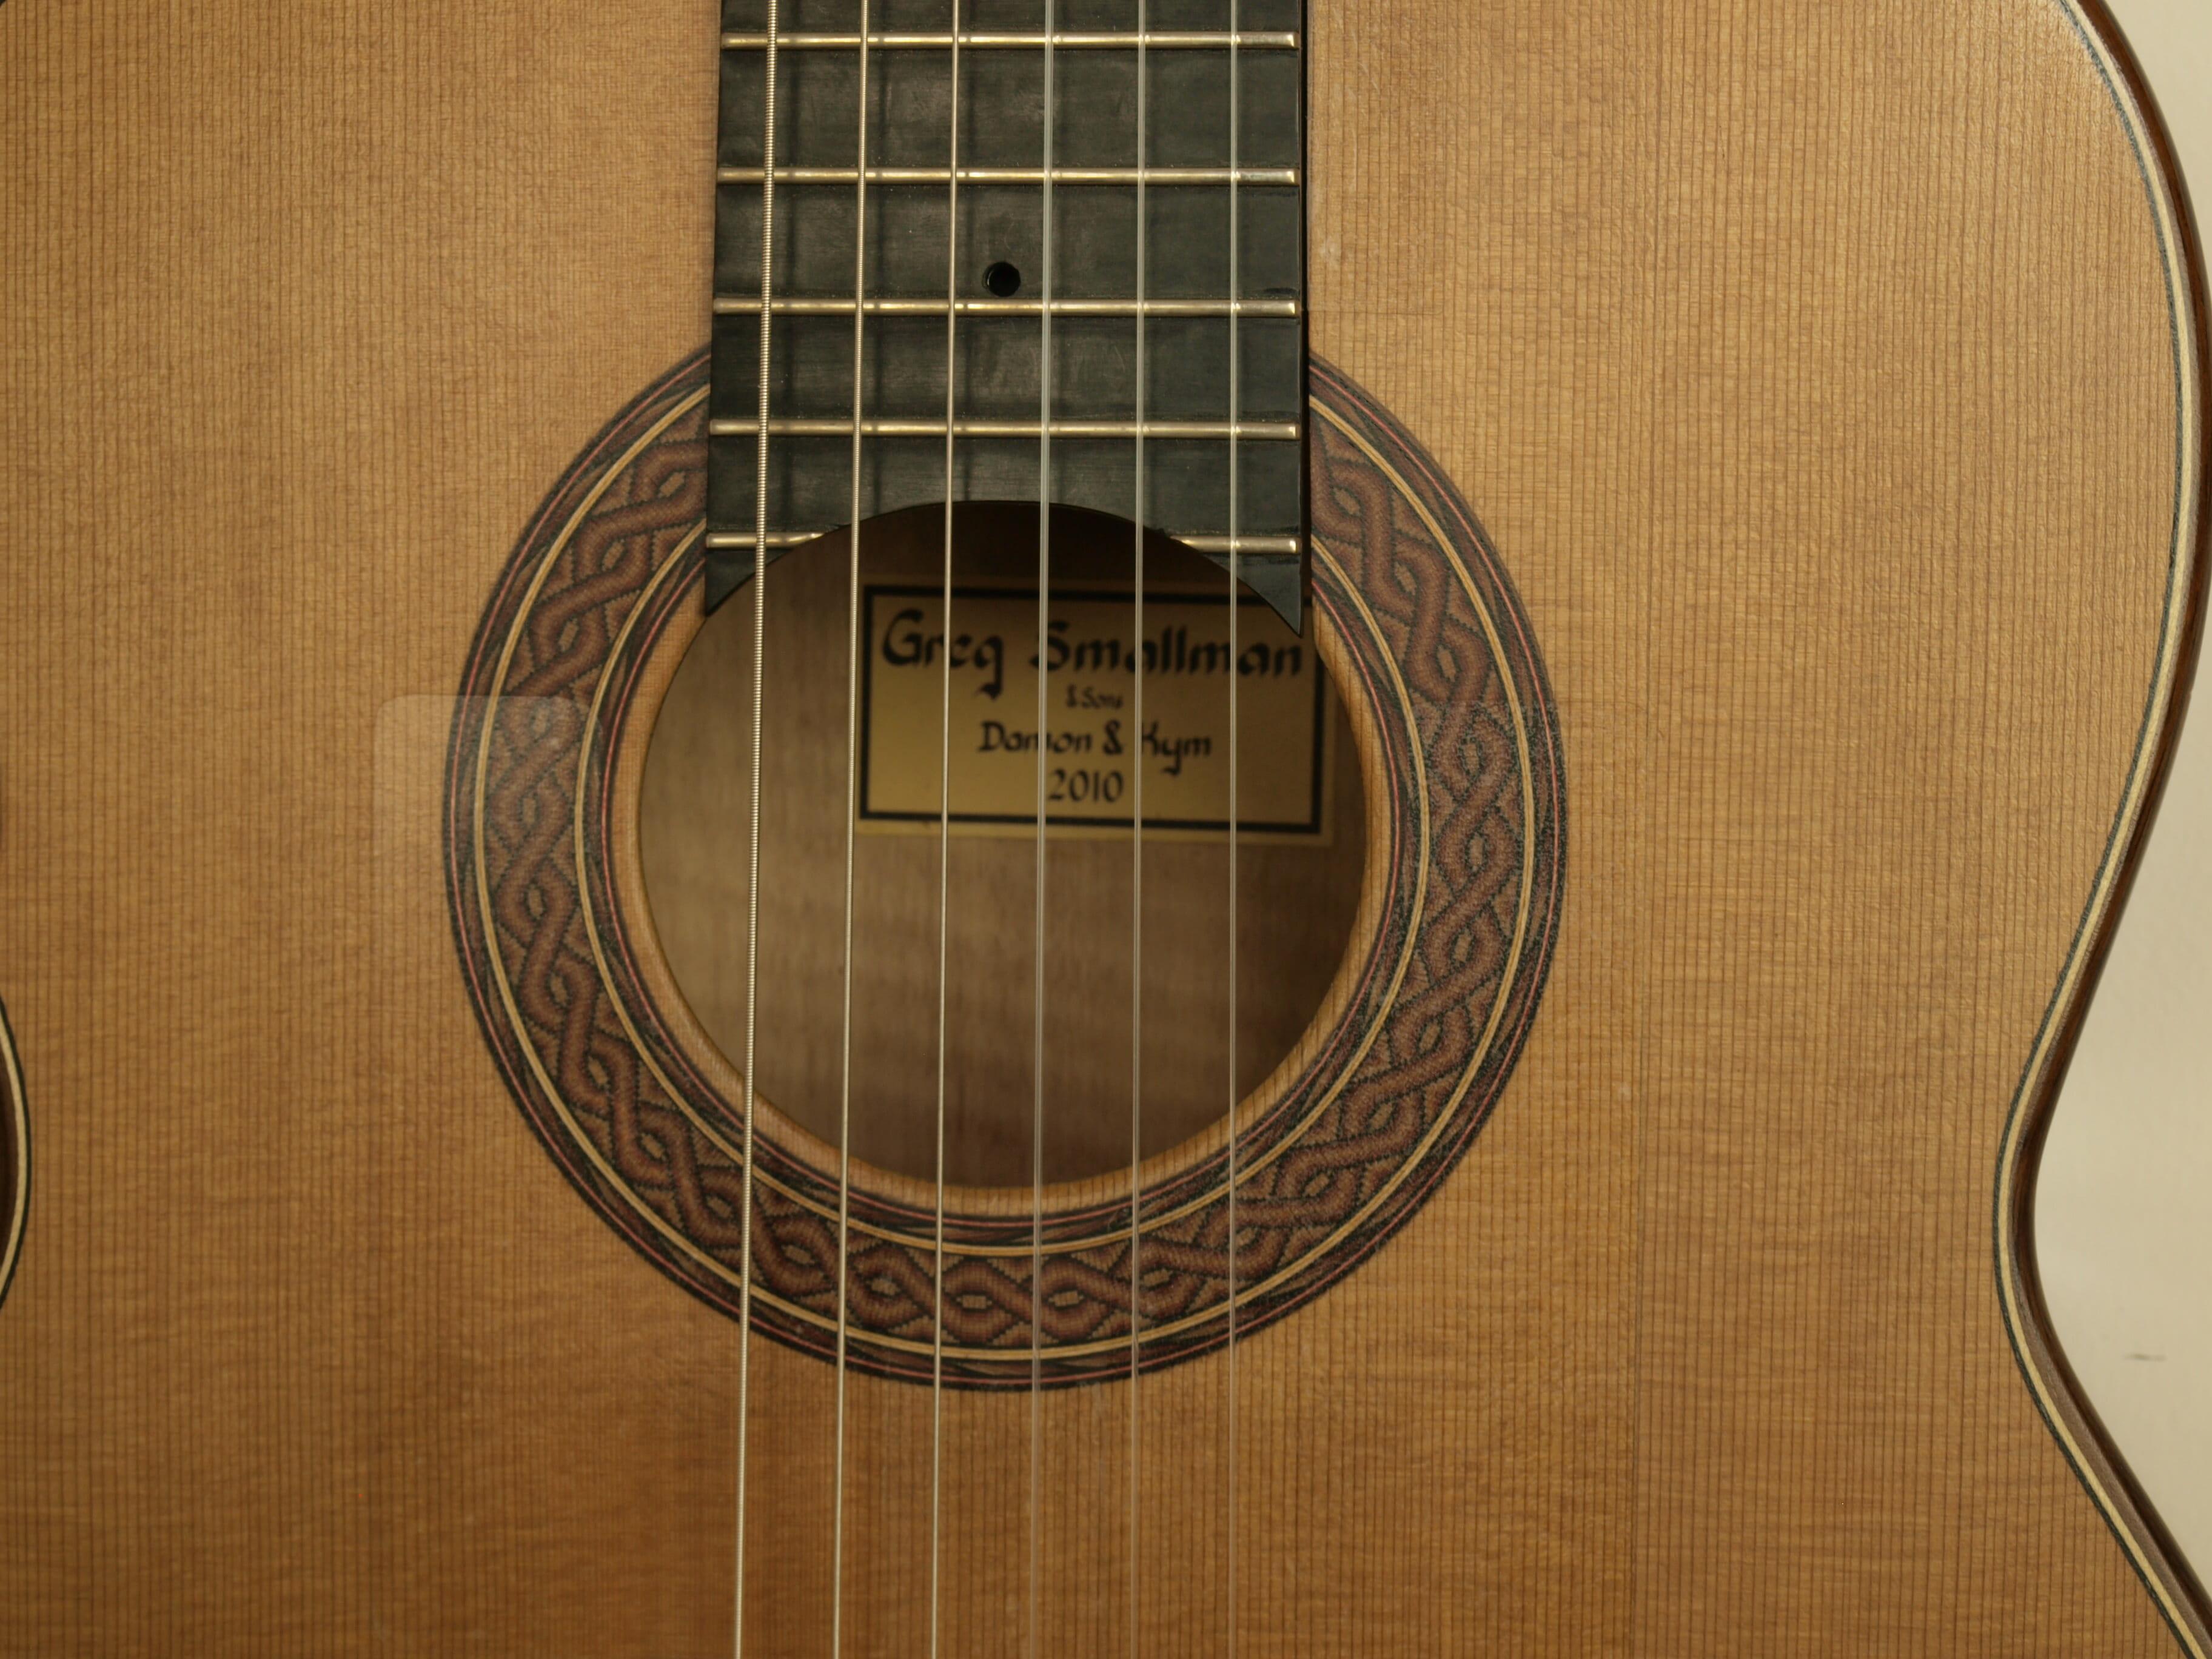 Greg Smallman guitare classique de luthier